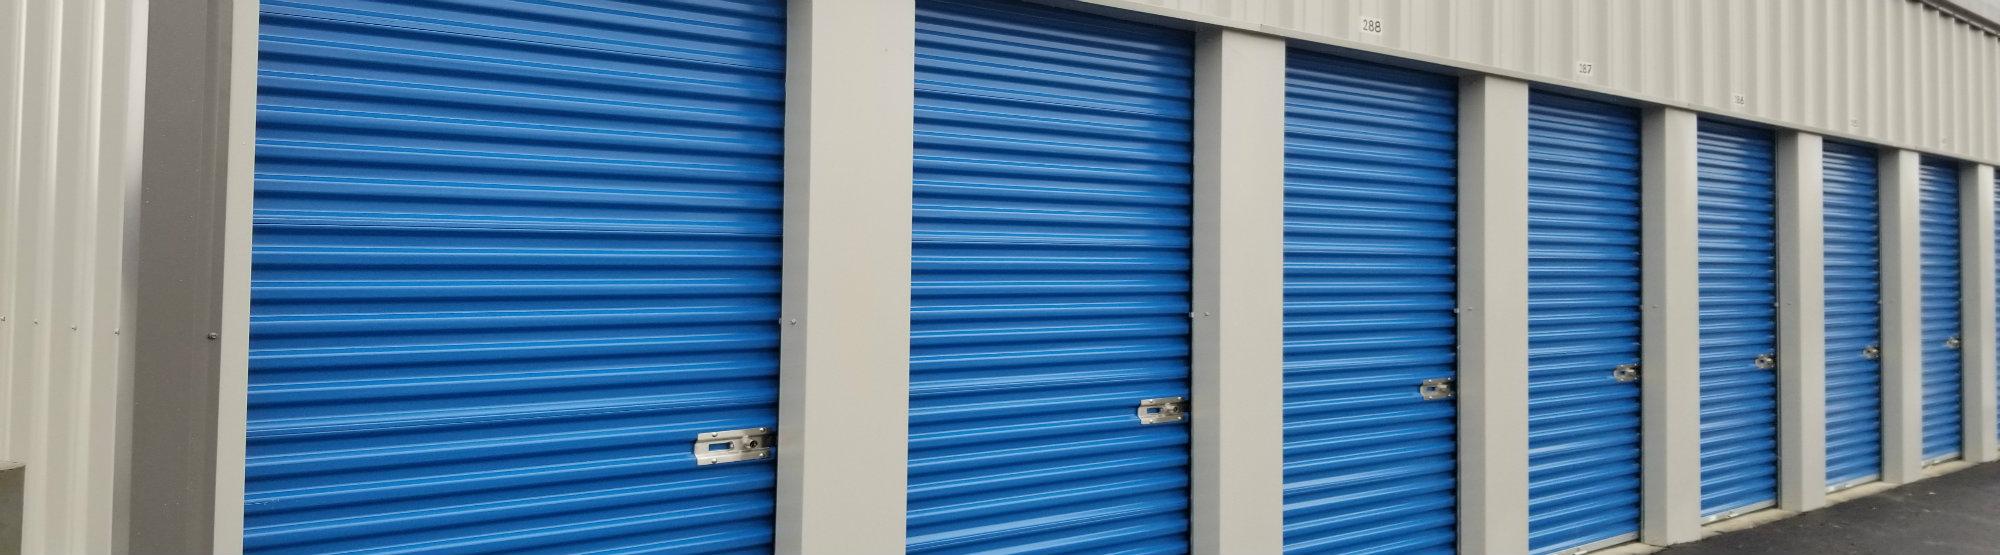 SmithField Safe Storage building